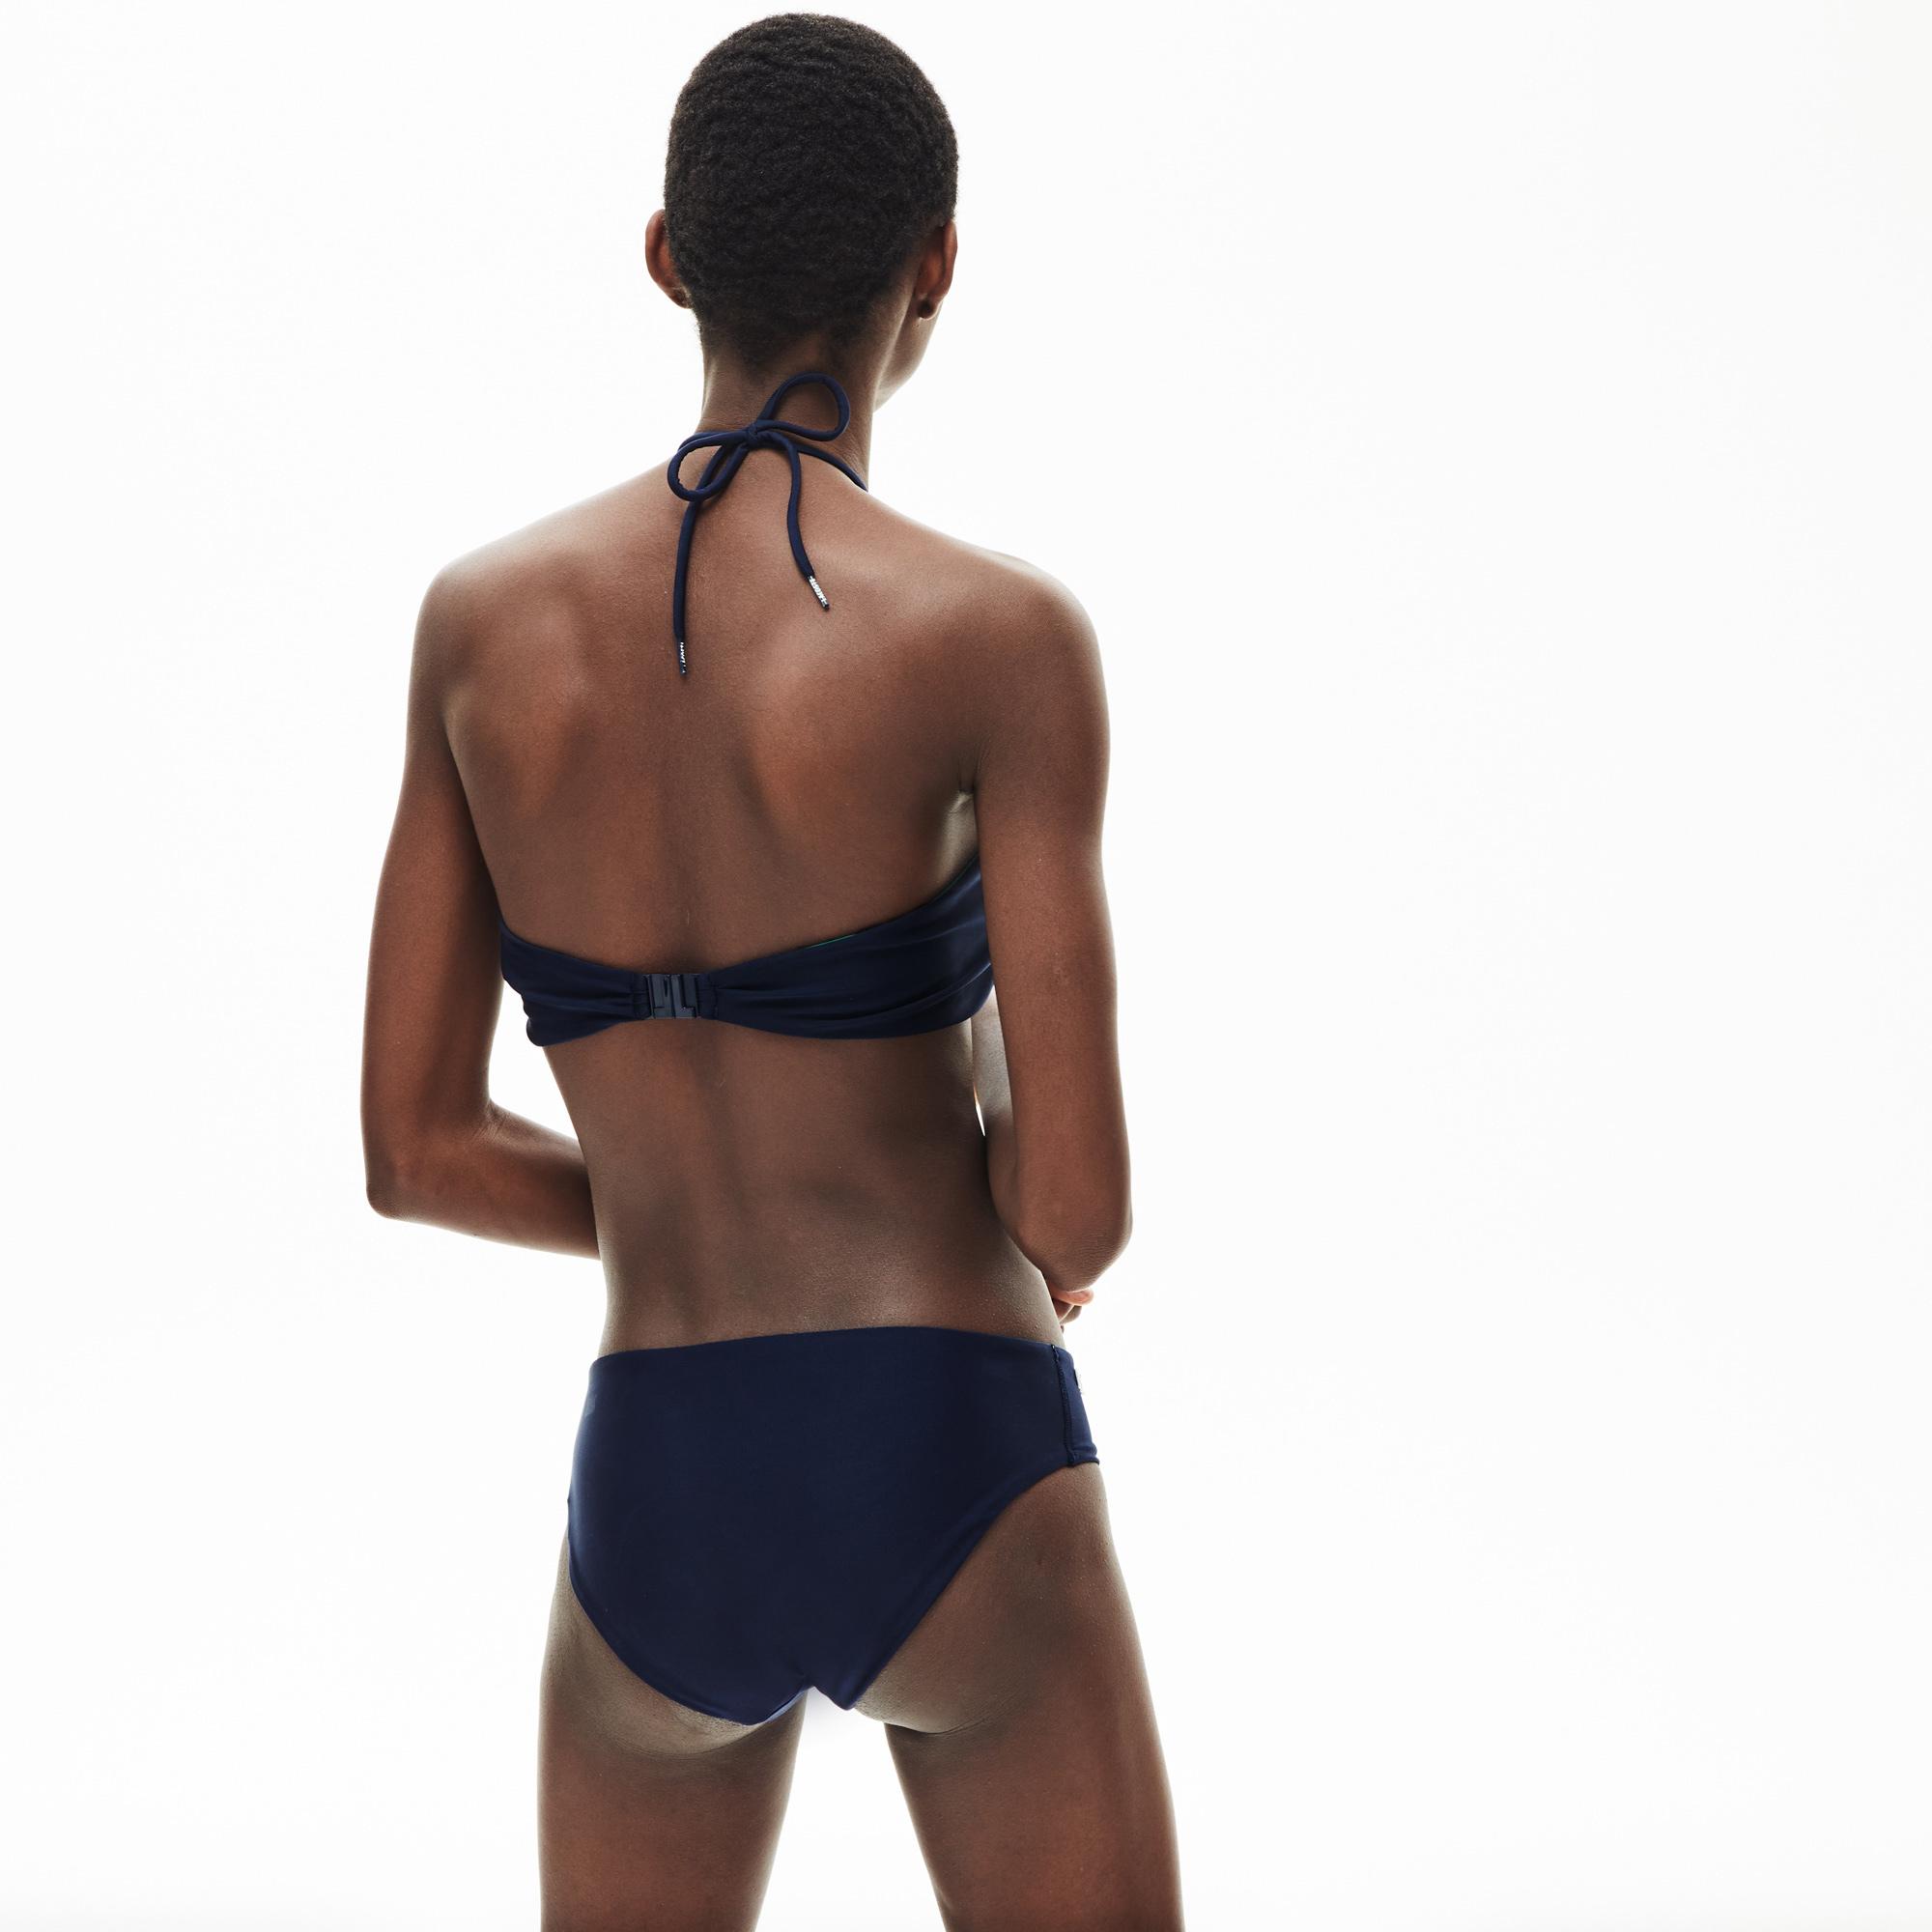 Lacoste купальник жіночий Recycled низ